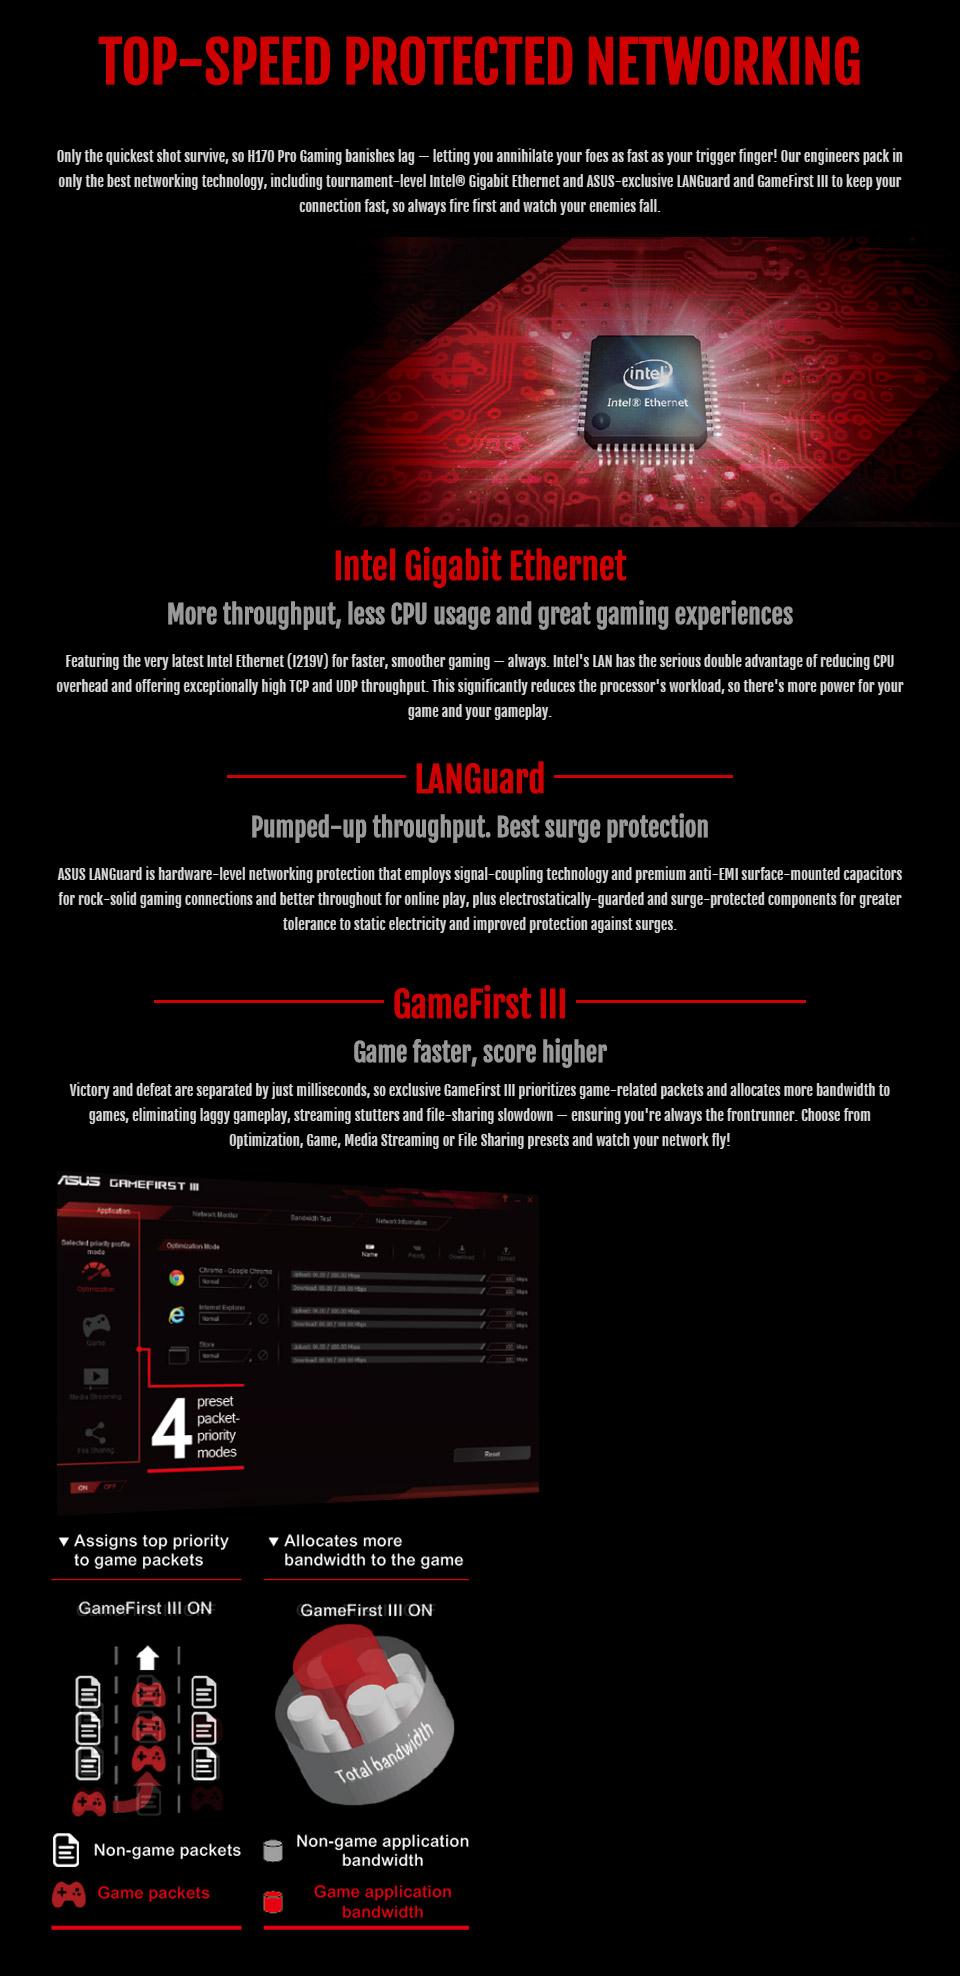 Asus H170 Pro Gaming Motherboard Pc Case Gear Asush170 Socket 1151 Lga Chipset Intel 6x Usb 30 4 Rear 2 Internal Gigabit Lan Supremefx Audio Dvi D Sub Hdmi Displayport Atx Form Factor Backed By A 3 Year Warranty